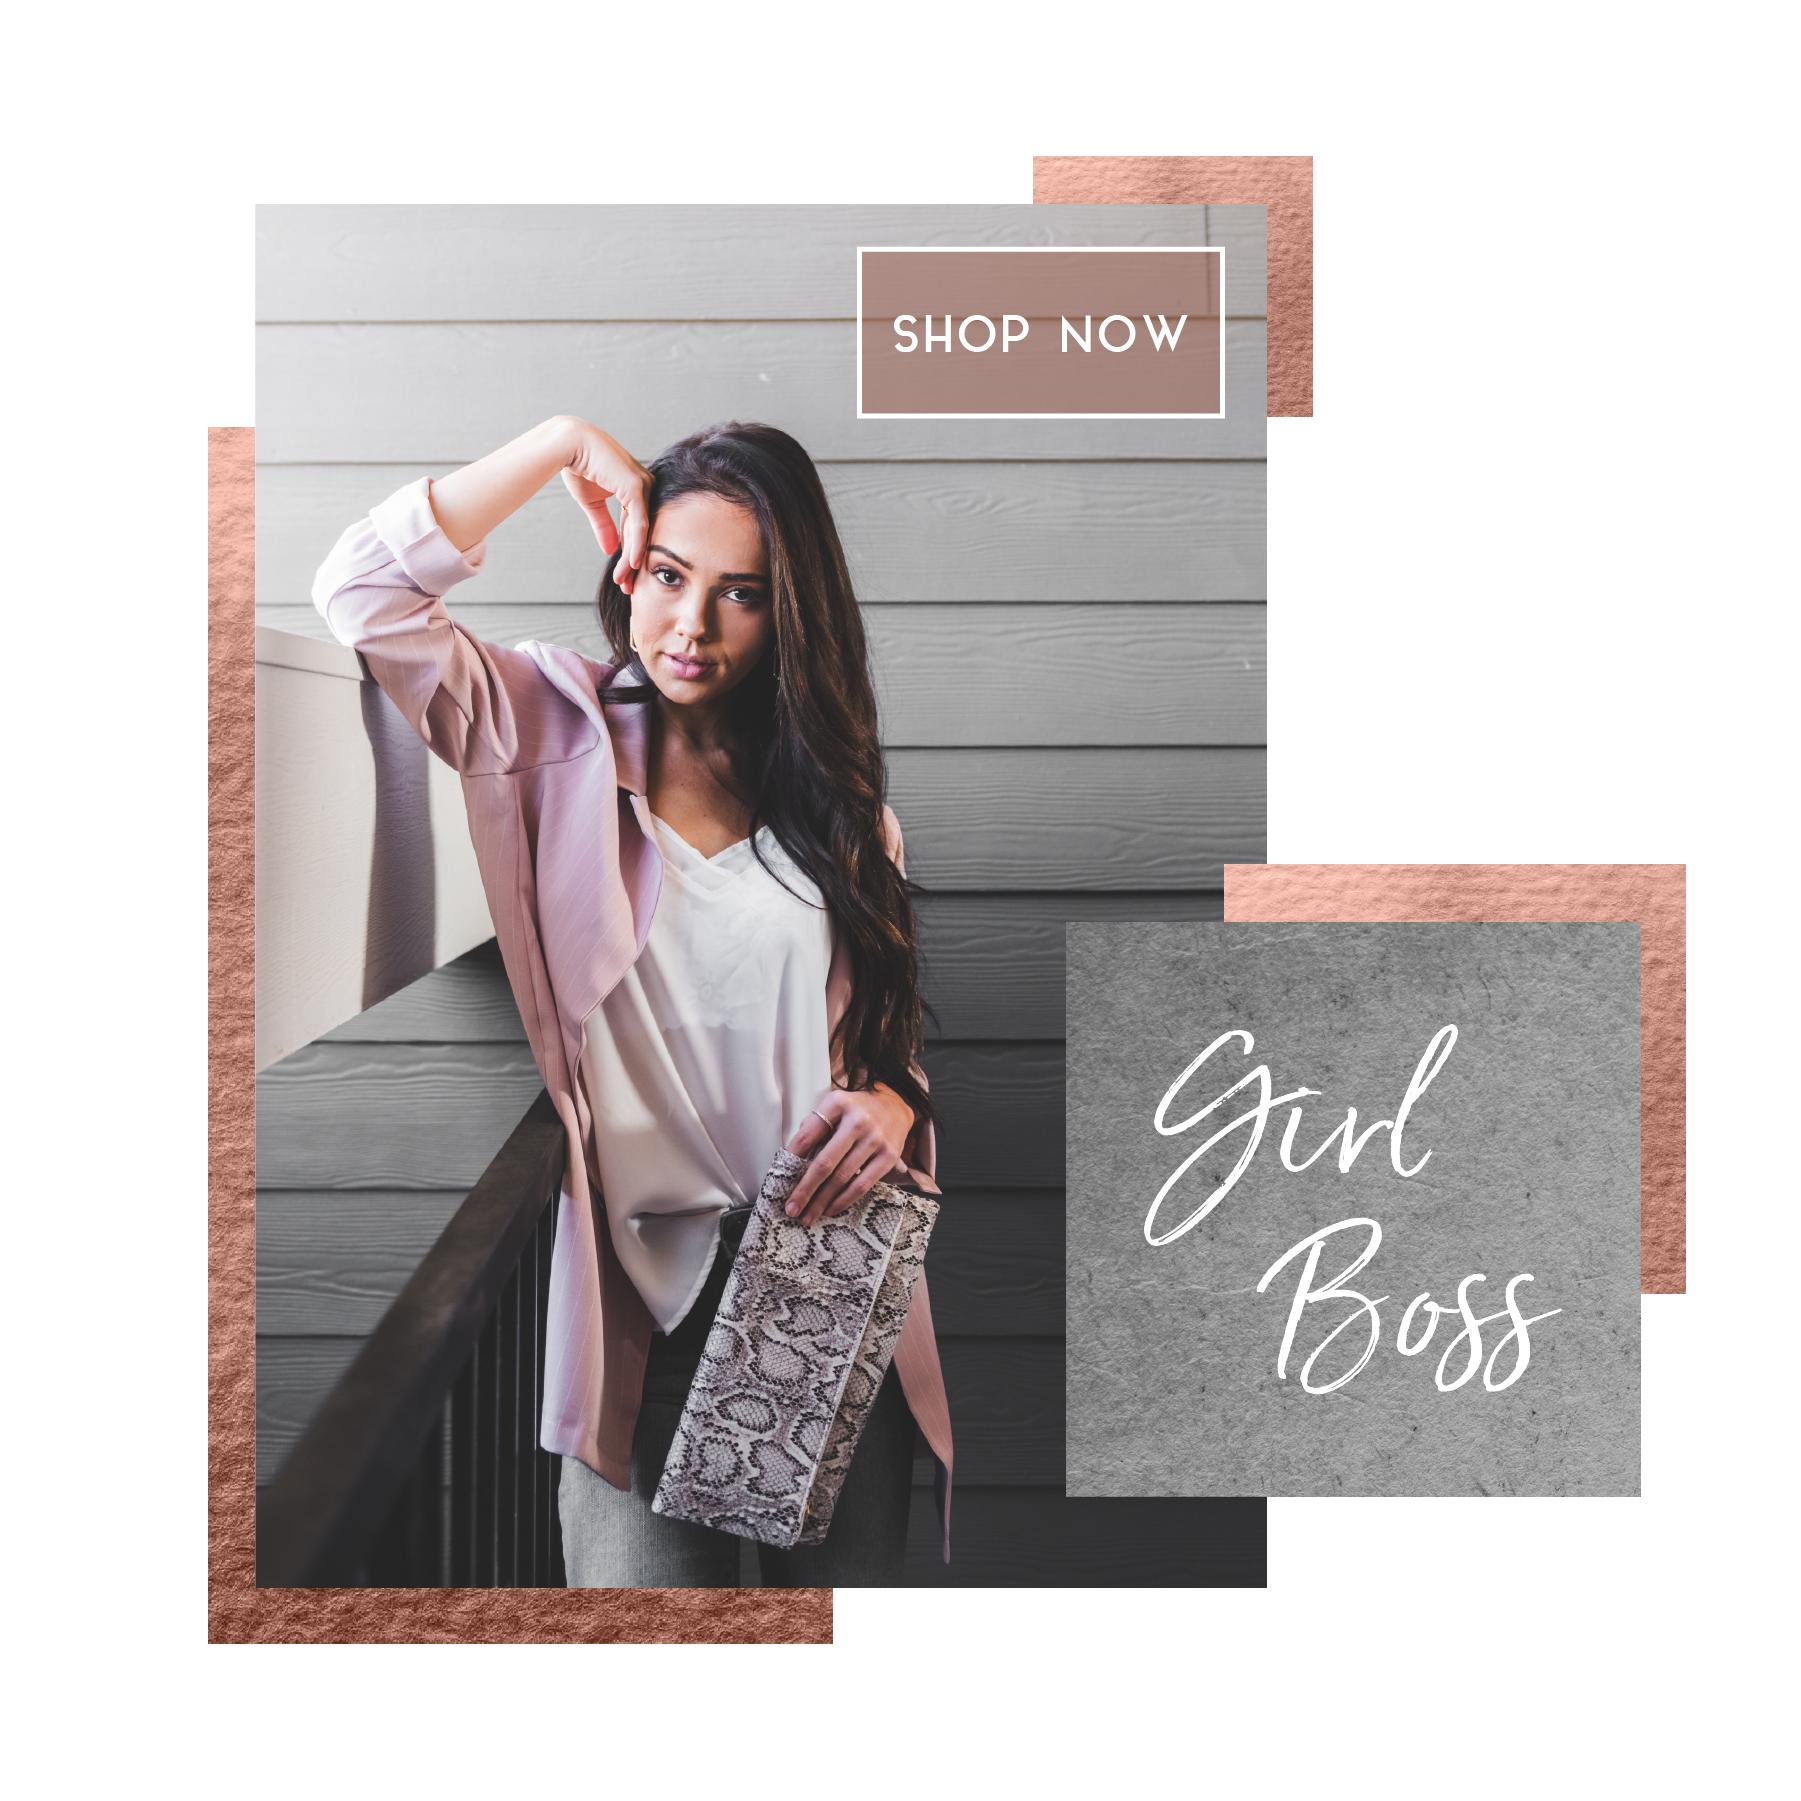 dresses for work, women's blouses for work, work pants